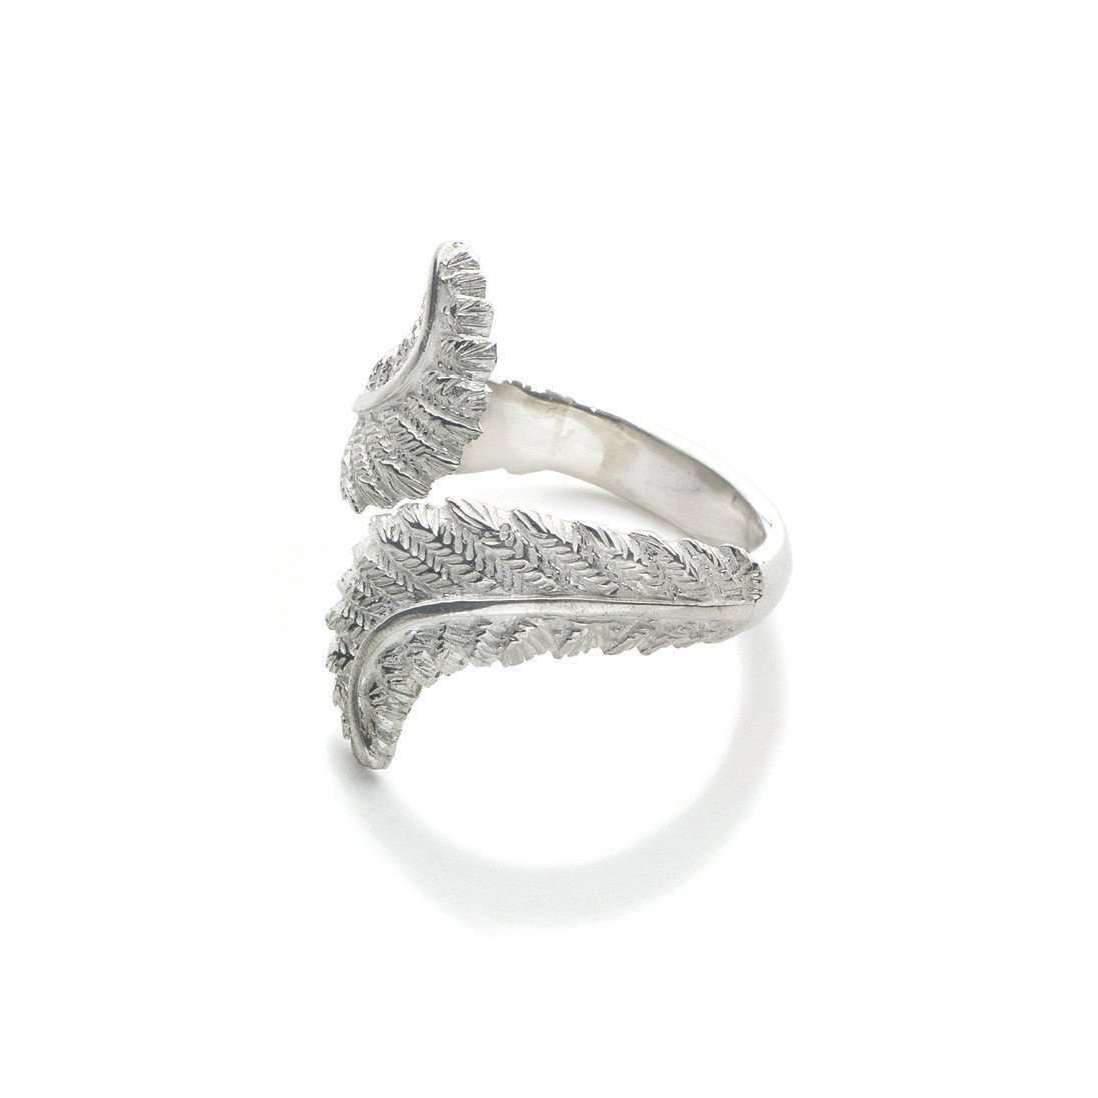 Patience Jewellery Fern Ring VM - UK L - US 5 1/2 - EU 51 3/4 SAxO4